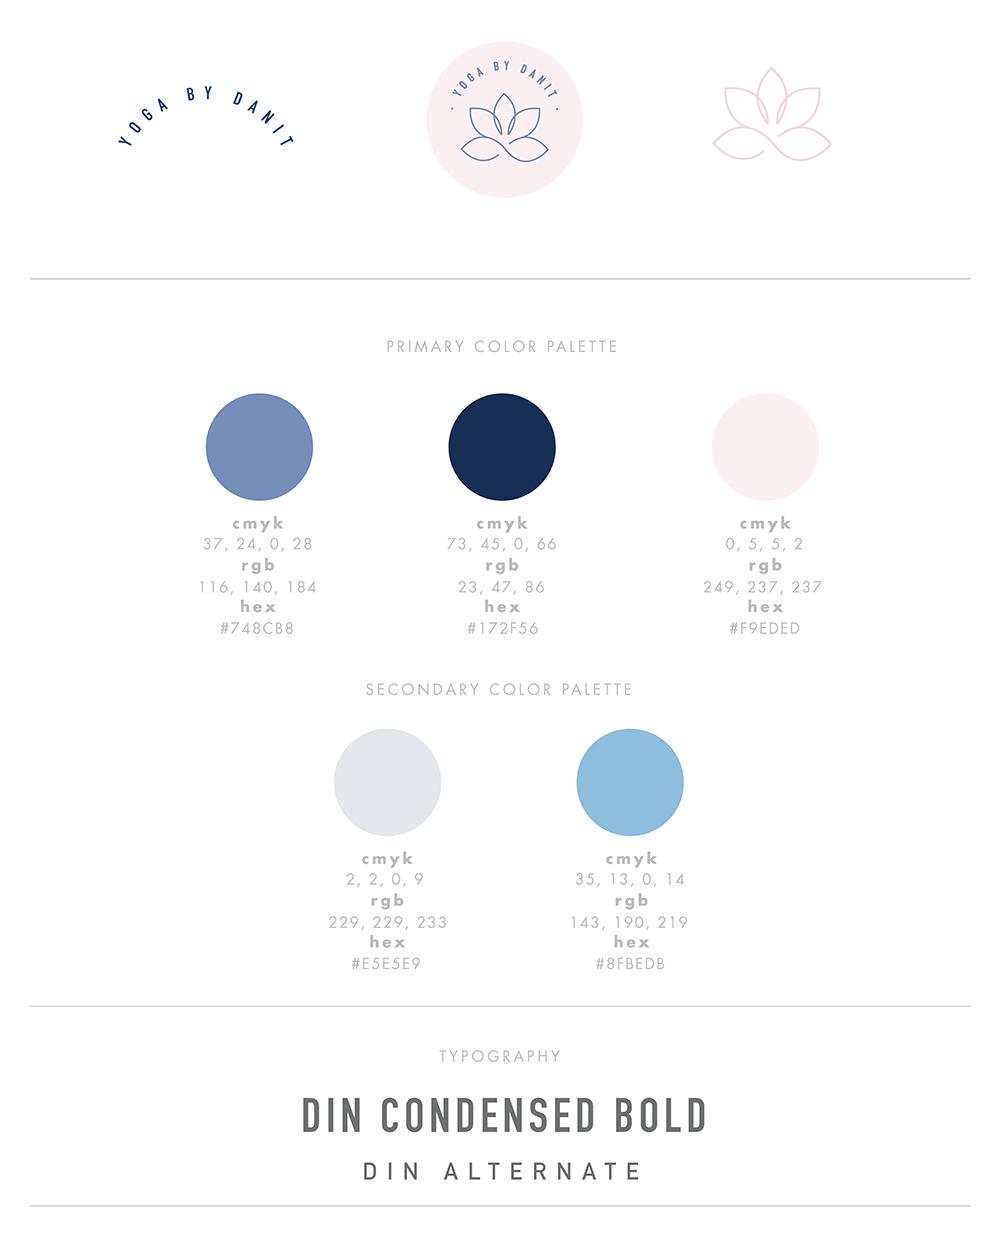 YOGA BY DANIT - BRANDING & GO LIVE IN 5™ WEB DESIGN — June